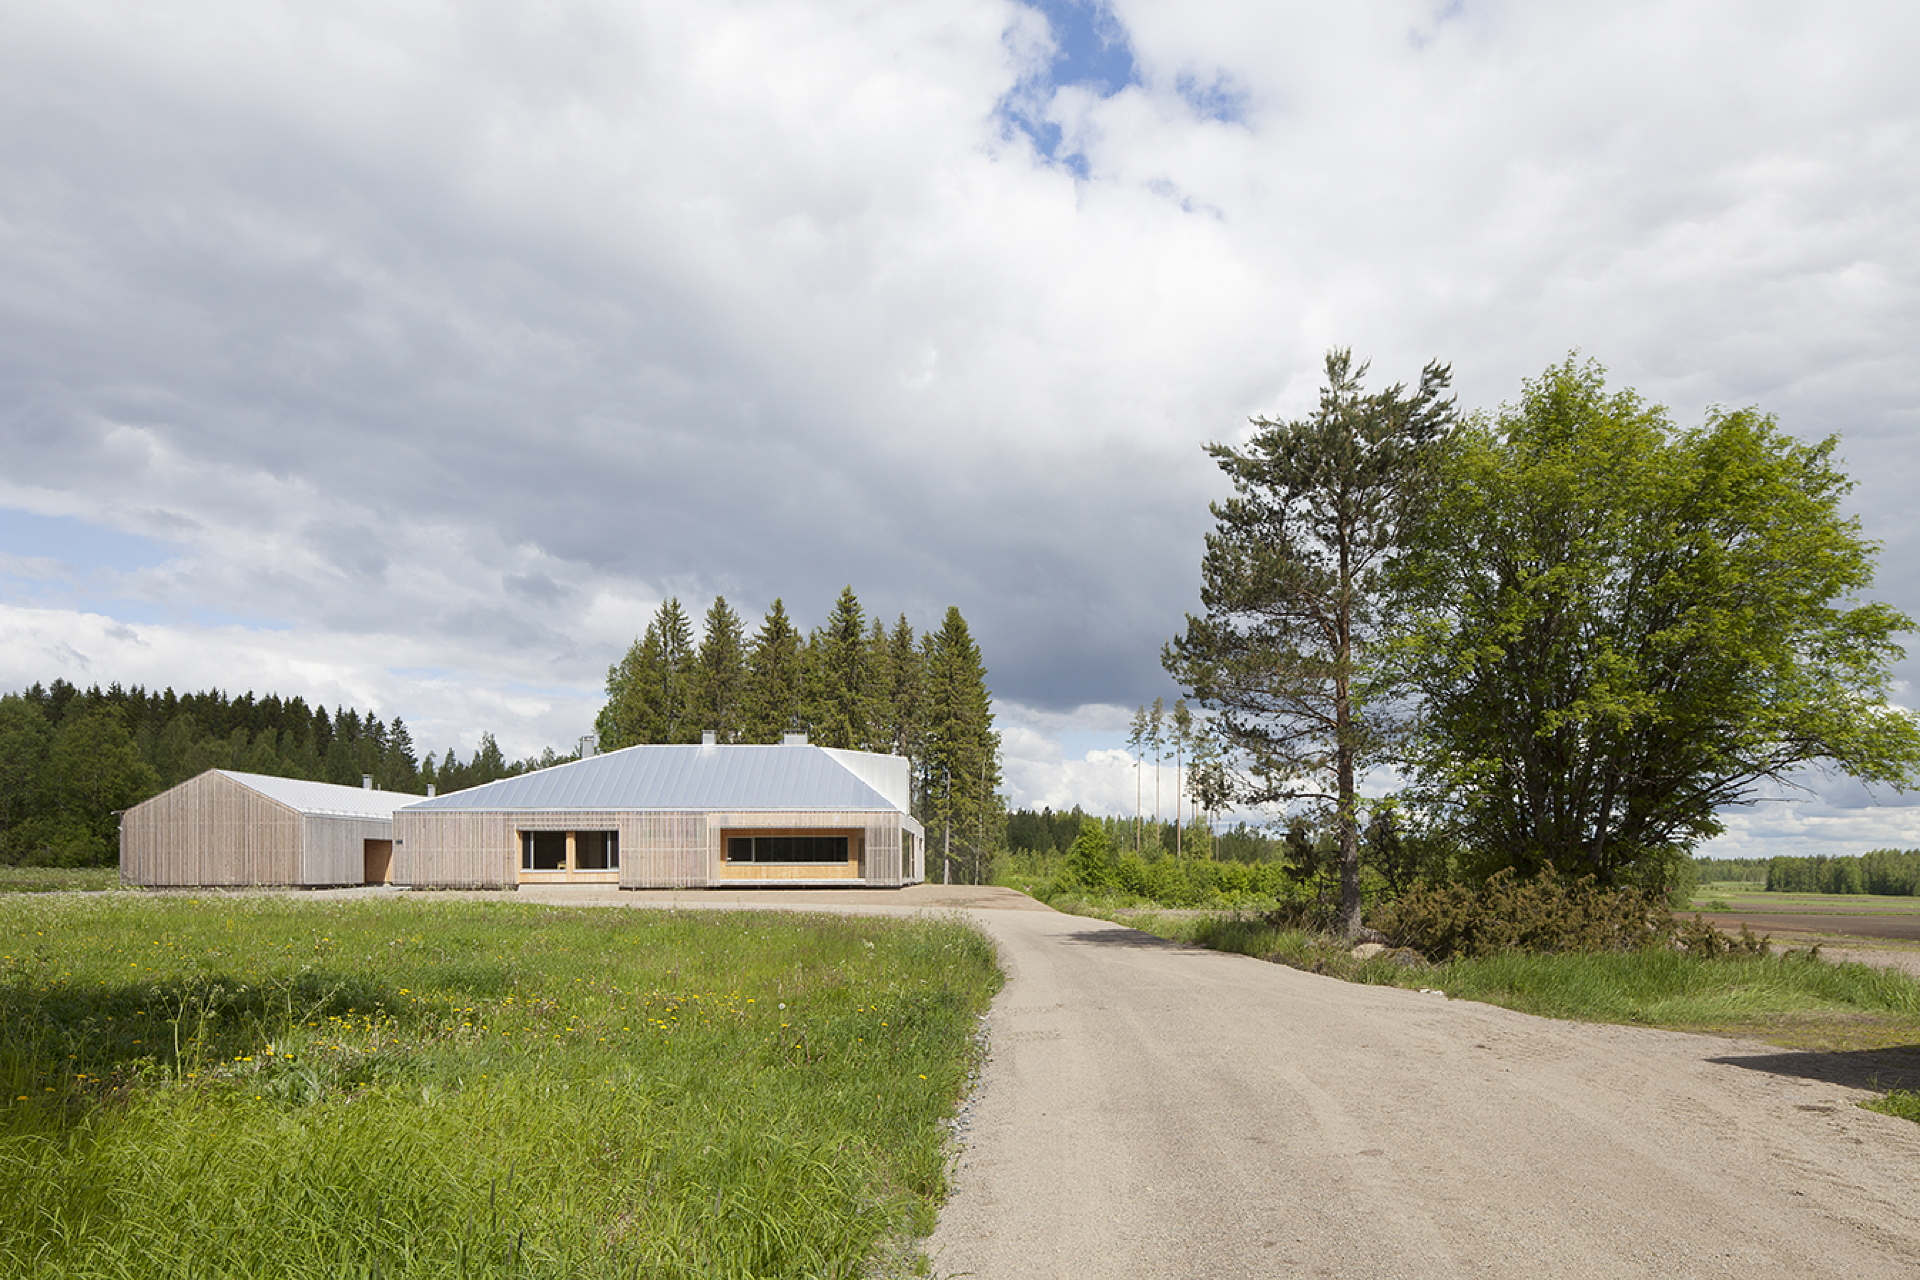 OOPEAA: Casa Riihi a Alajärvi (Finlandia)